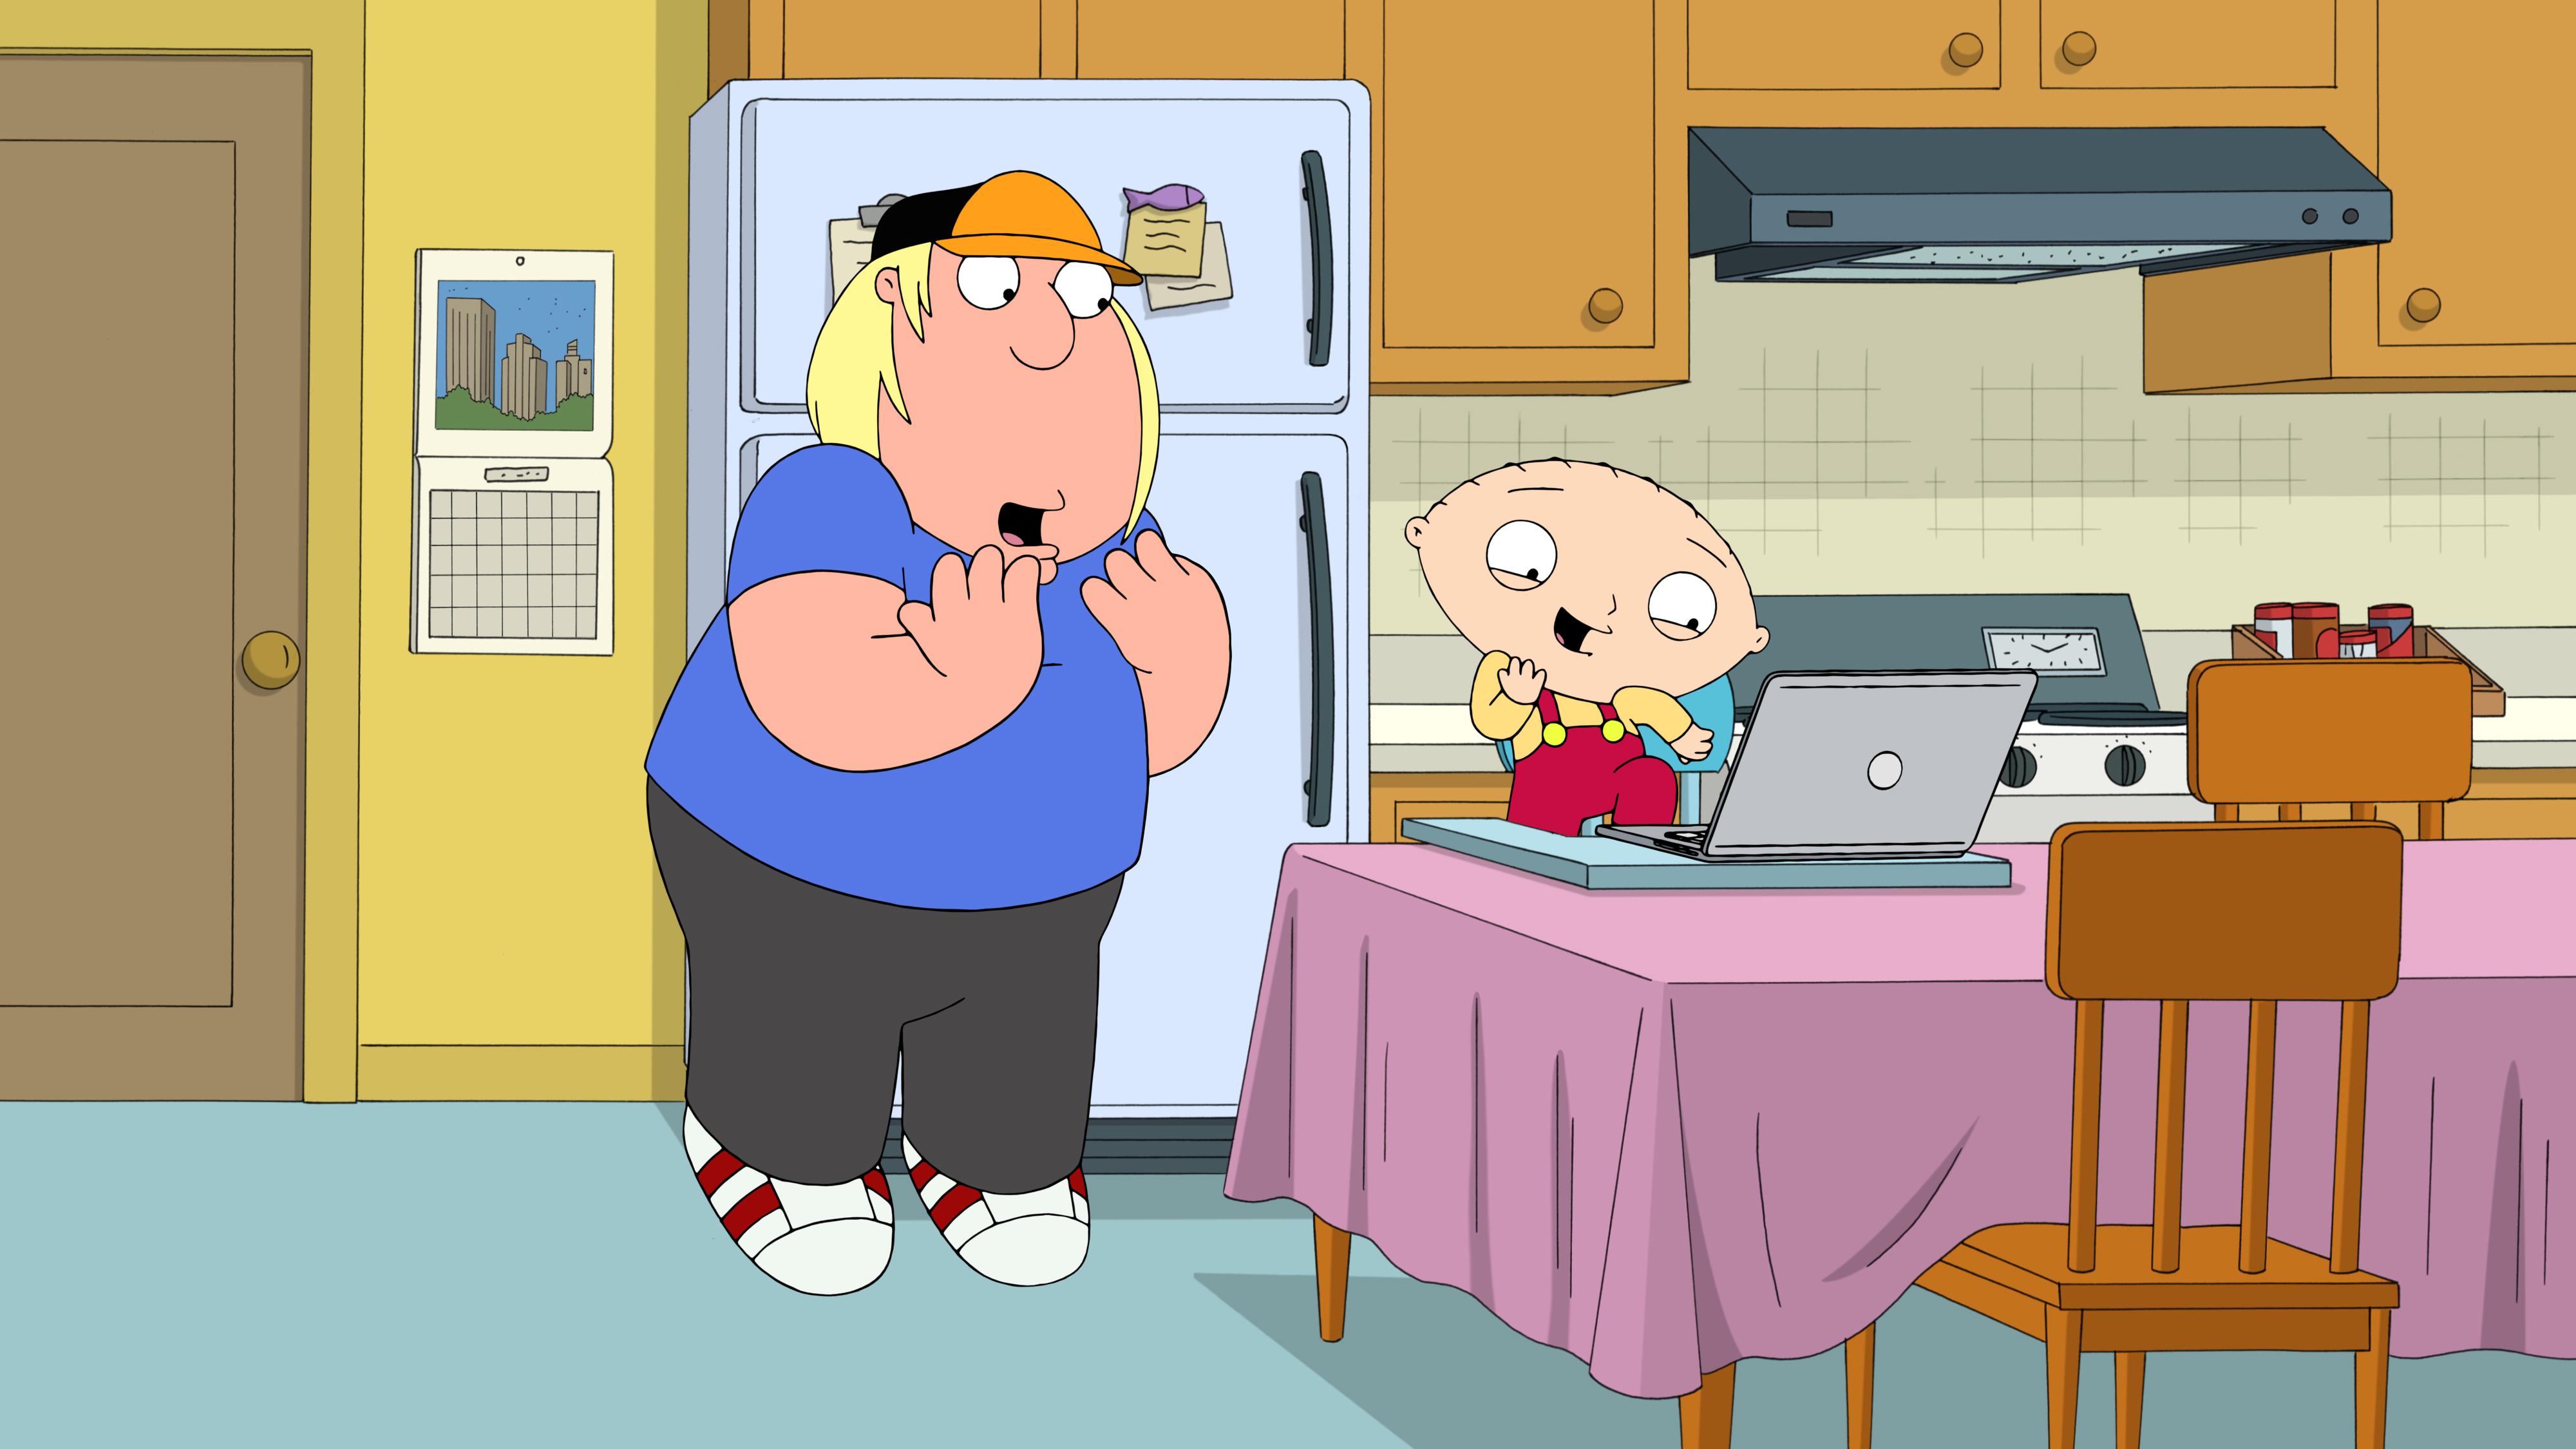 Rallo vs stewie yahoo dating